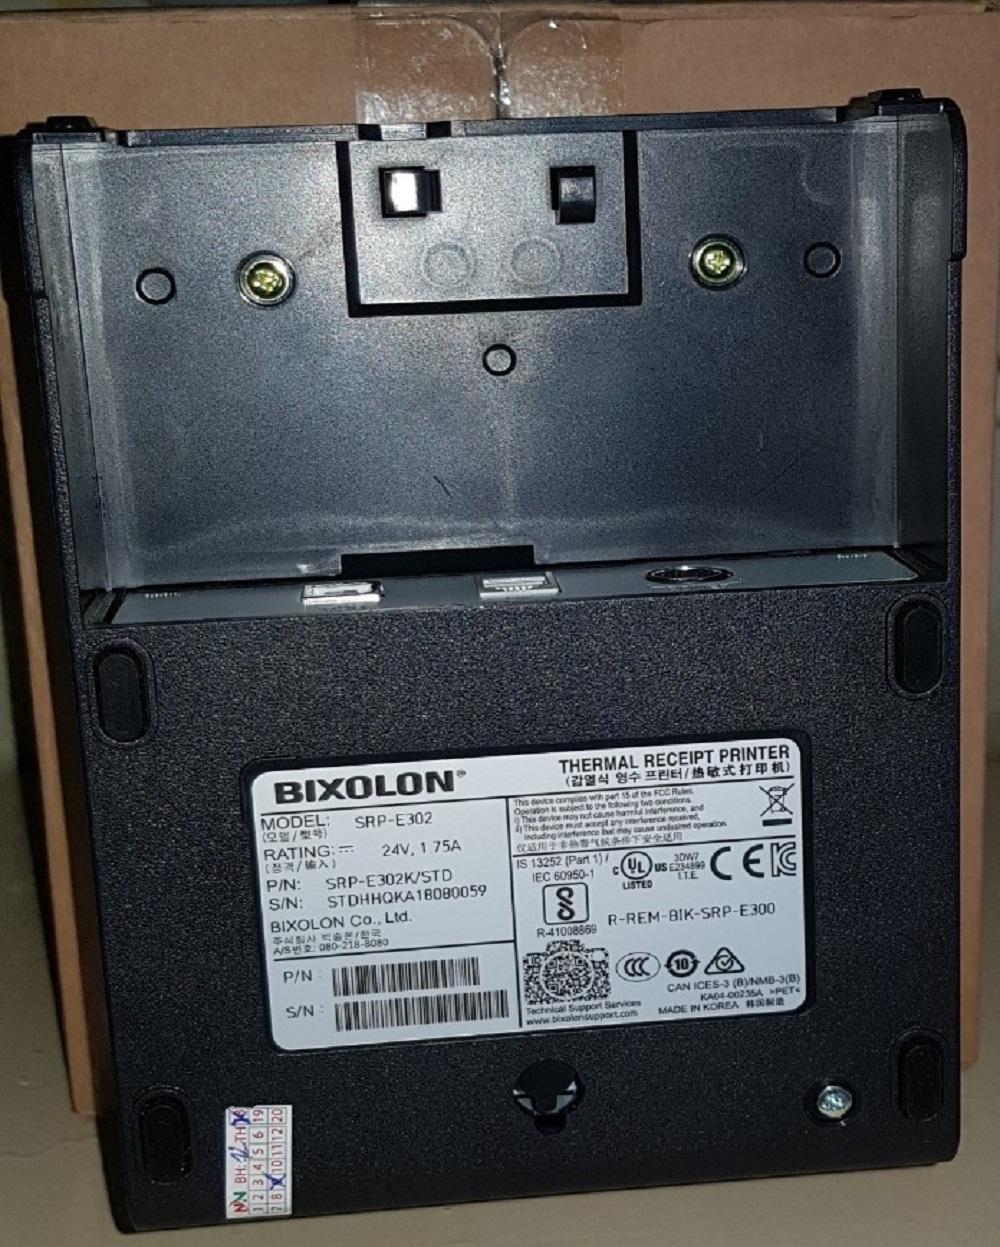 Máy in hóa đơn BIXOLON SRP-E302K (USB+LAN+RS232)